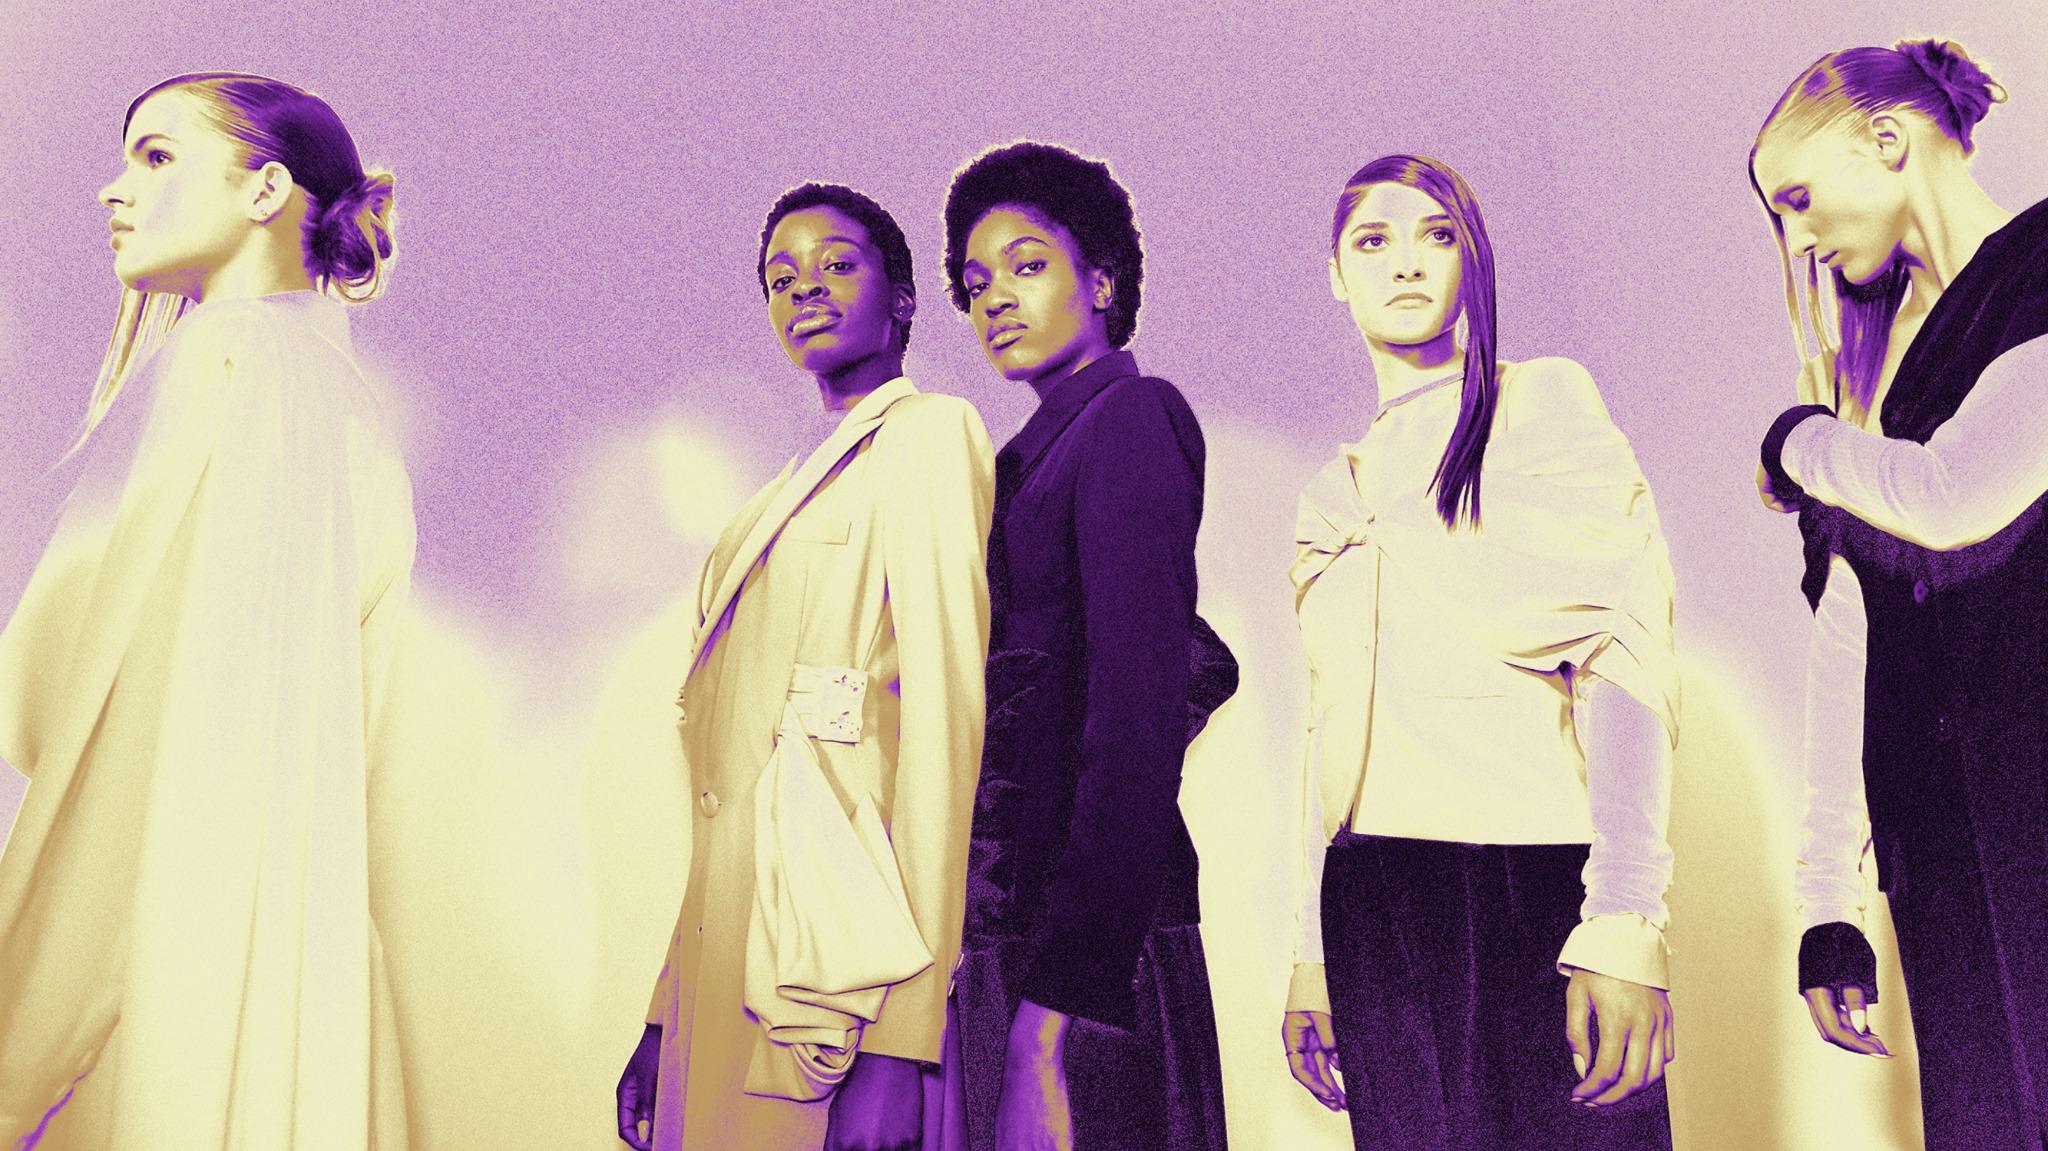 Emerging Europe S Young Designers Set To Take London Fashion Week By Storm Emerging Europe Intelligence Community News